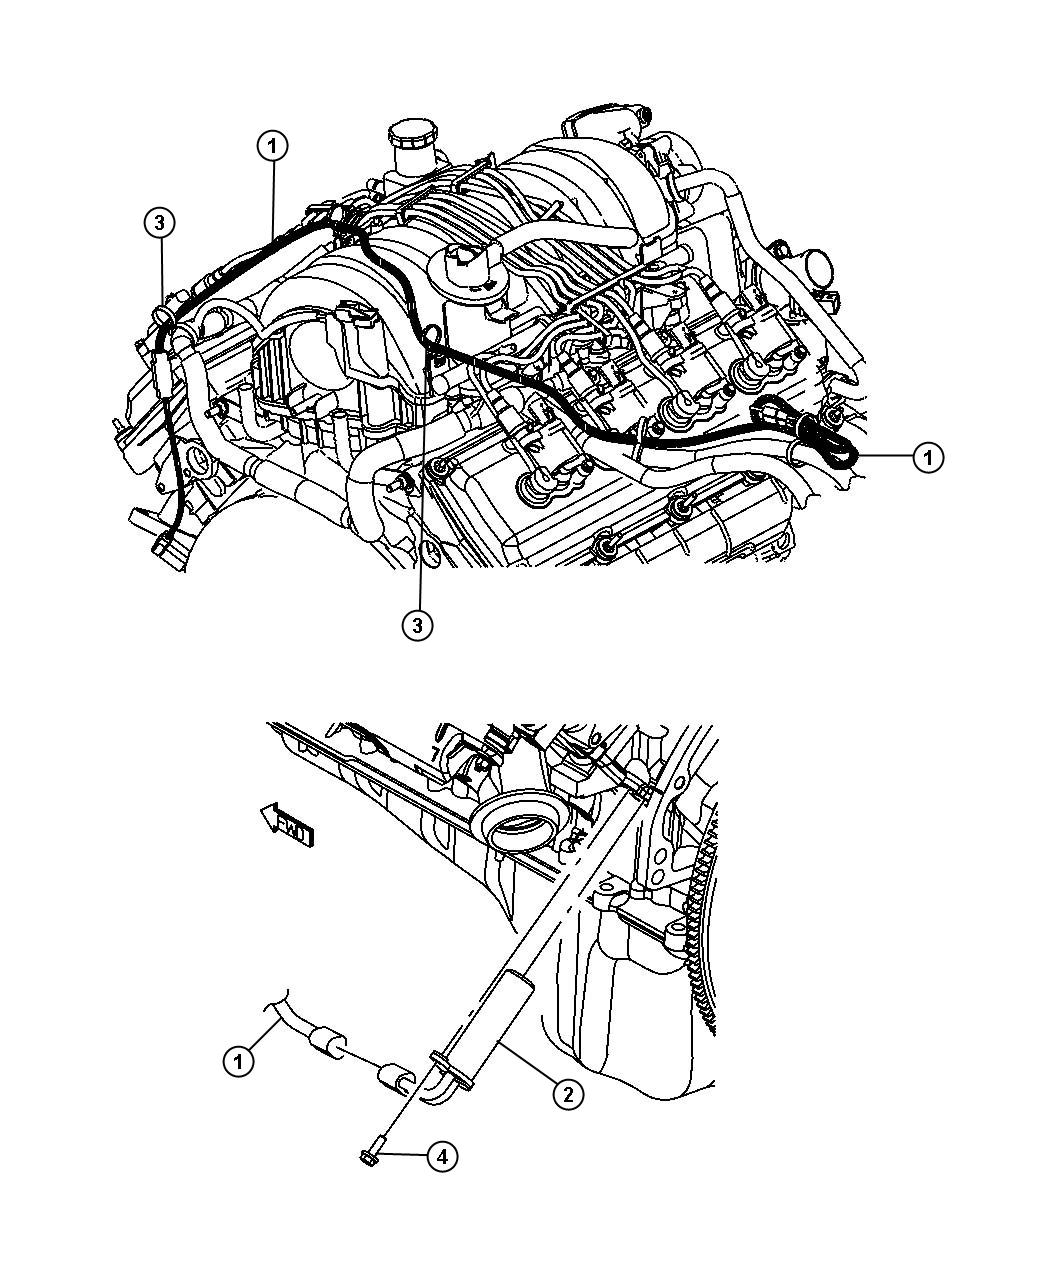 Dodge Charger Cord. Engine block heater. Mds, hemi